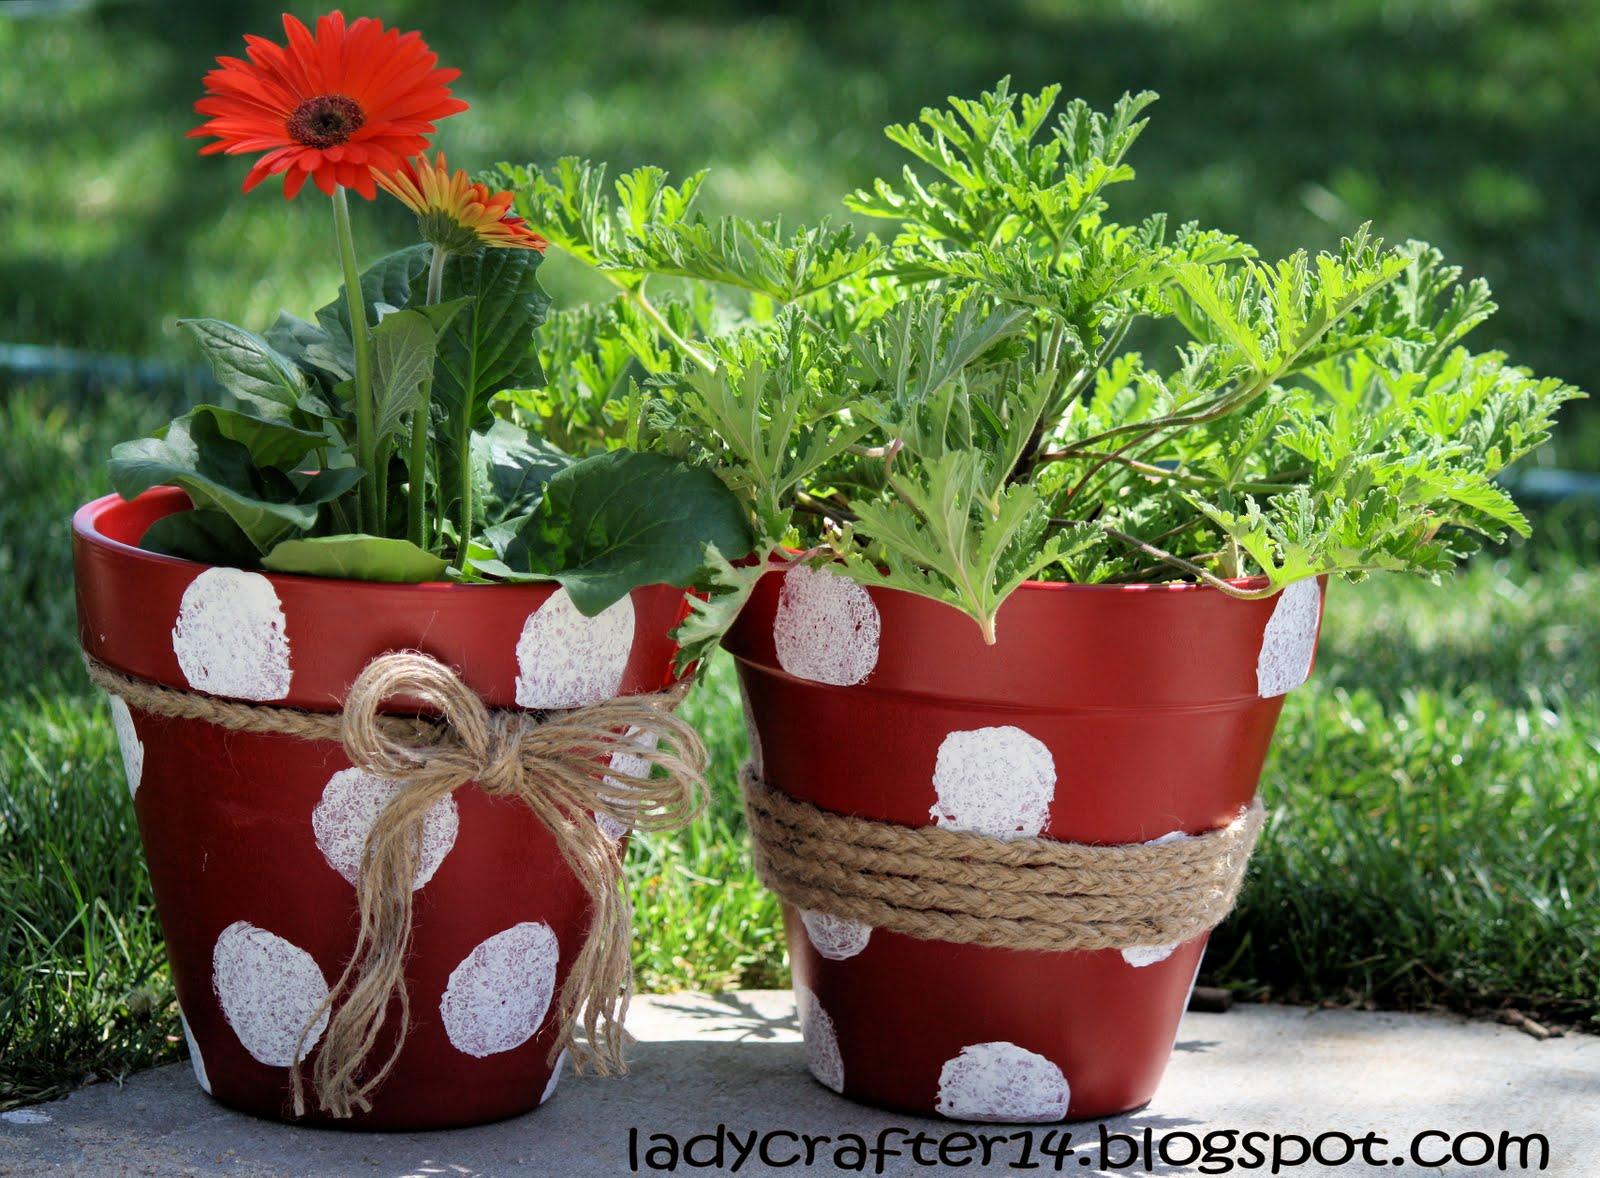 ladybugs crafts and 14???: diy groovy flower polka dot pots